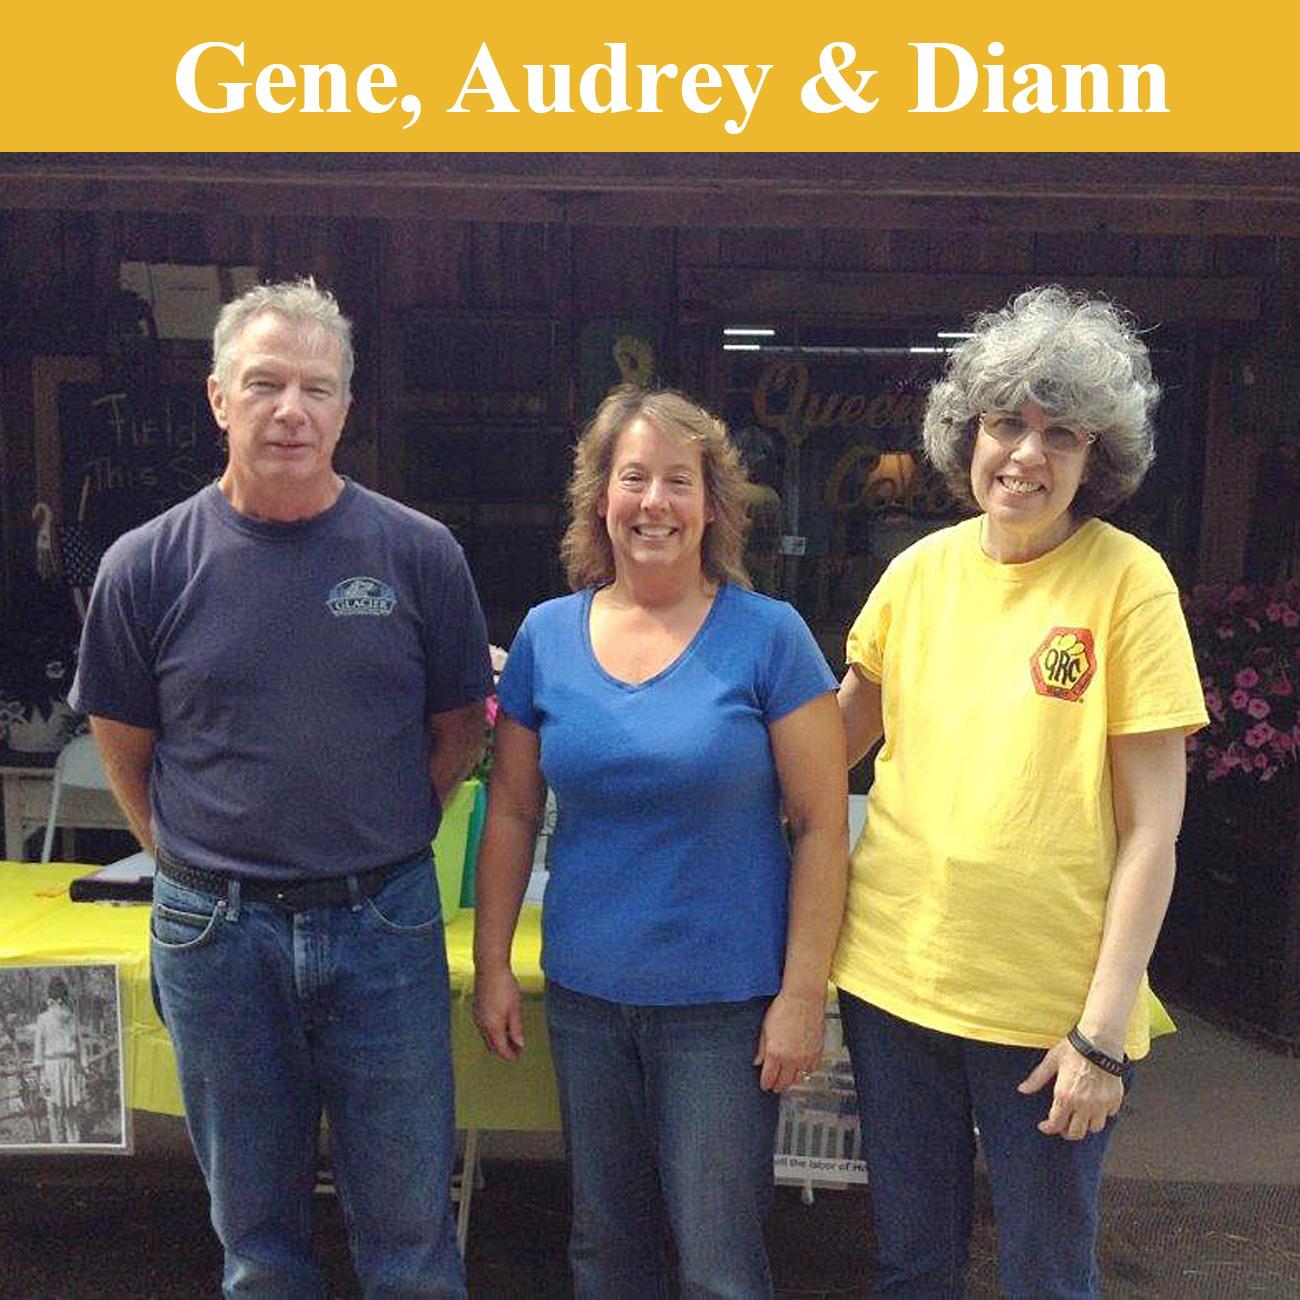 gene-audrey-diann